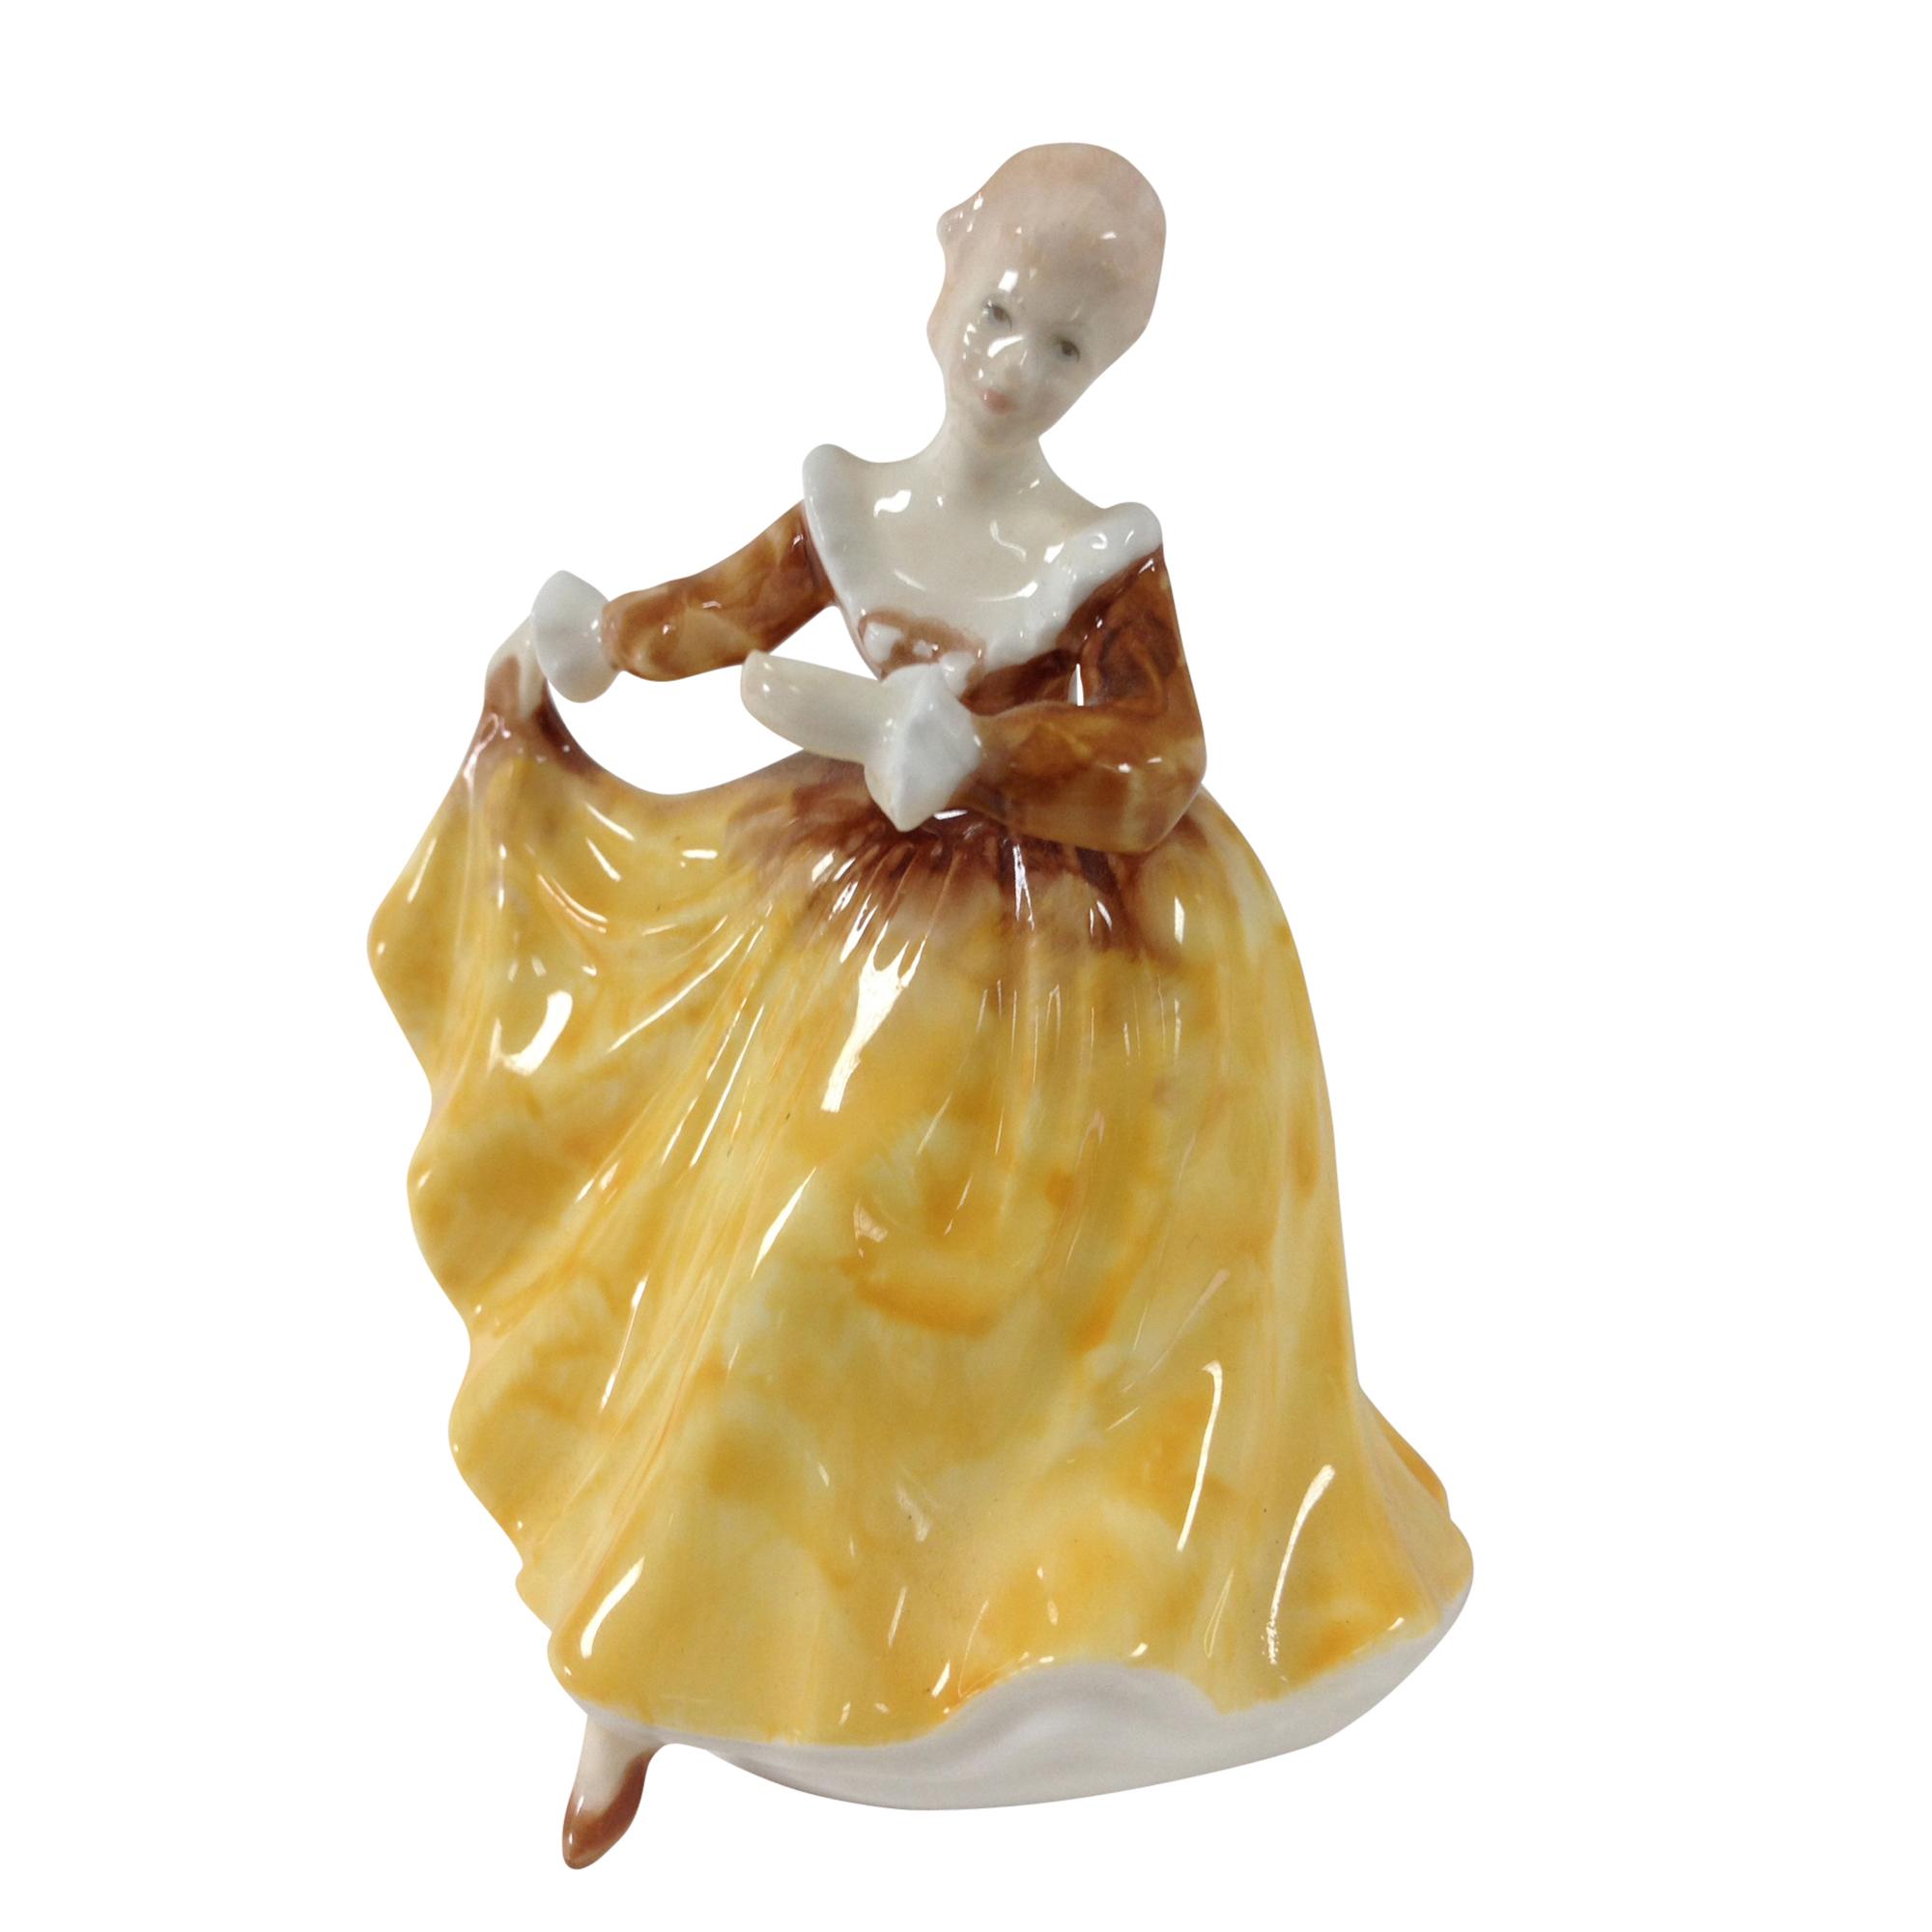 Kirsty Mini HN3743 - Royal Doulton Figurine